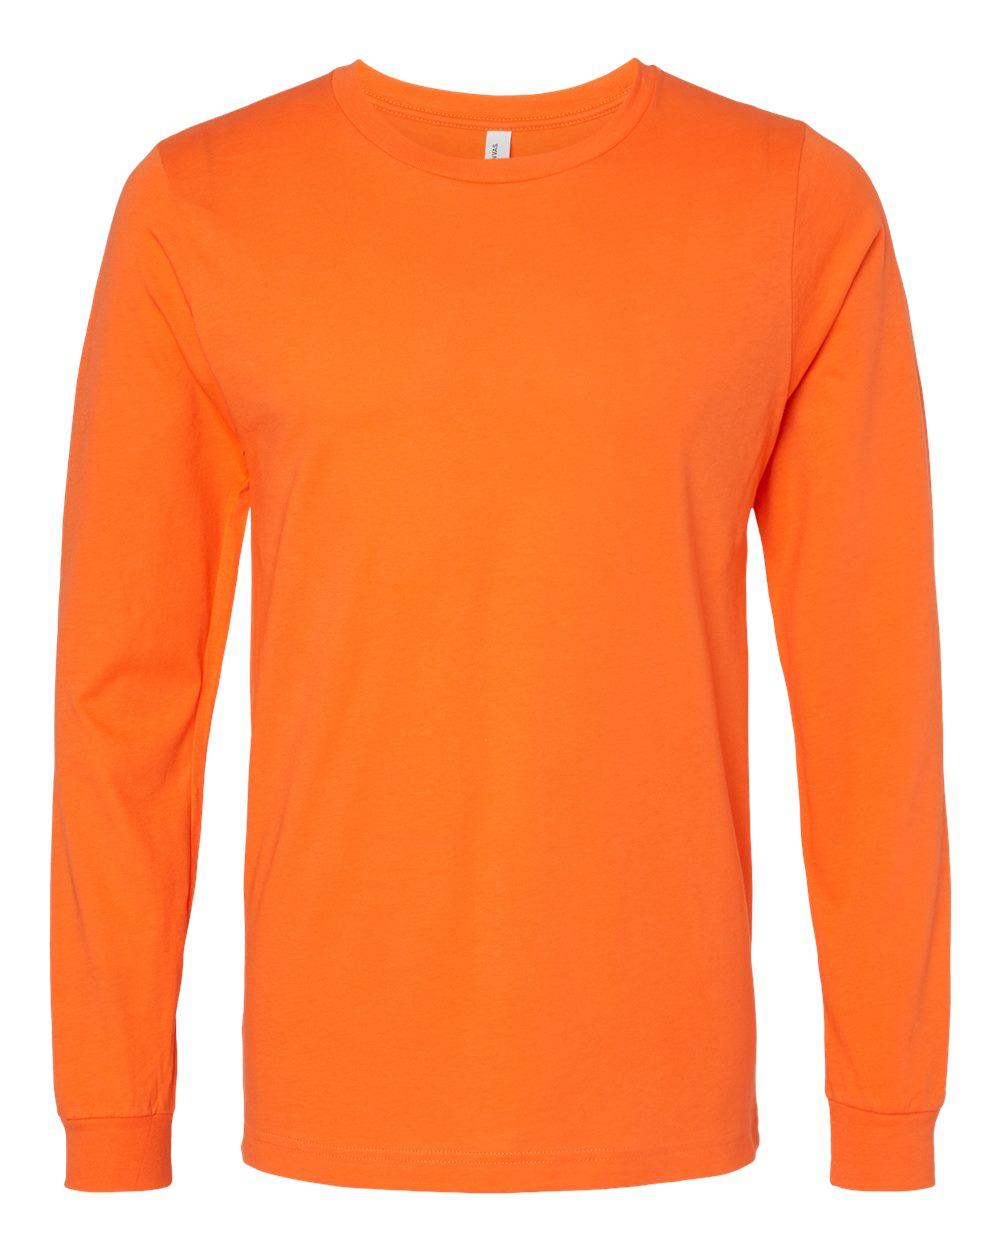 Bella-Canvas-Mens-Blank-Top-Long-Sleeve-Jersey-Tee-T-Shirt-3501-up-to-3XL thumbnail 46